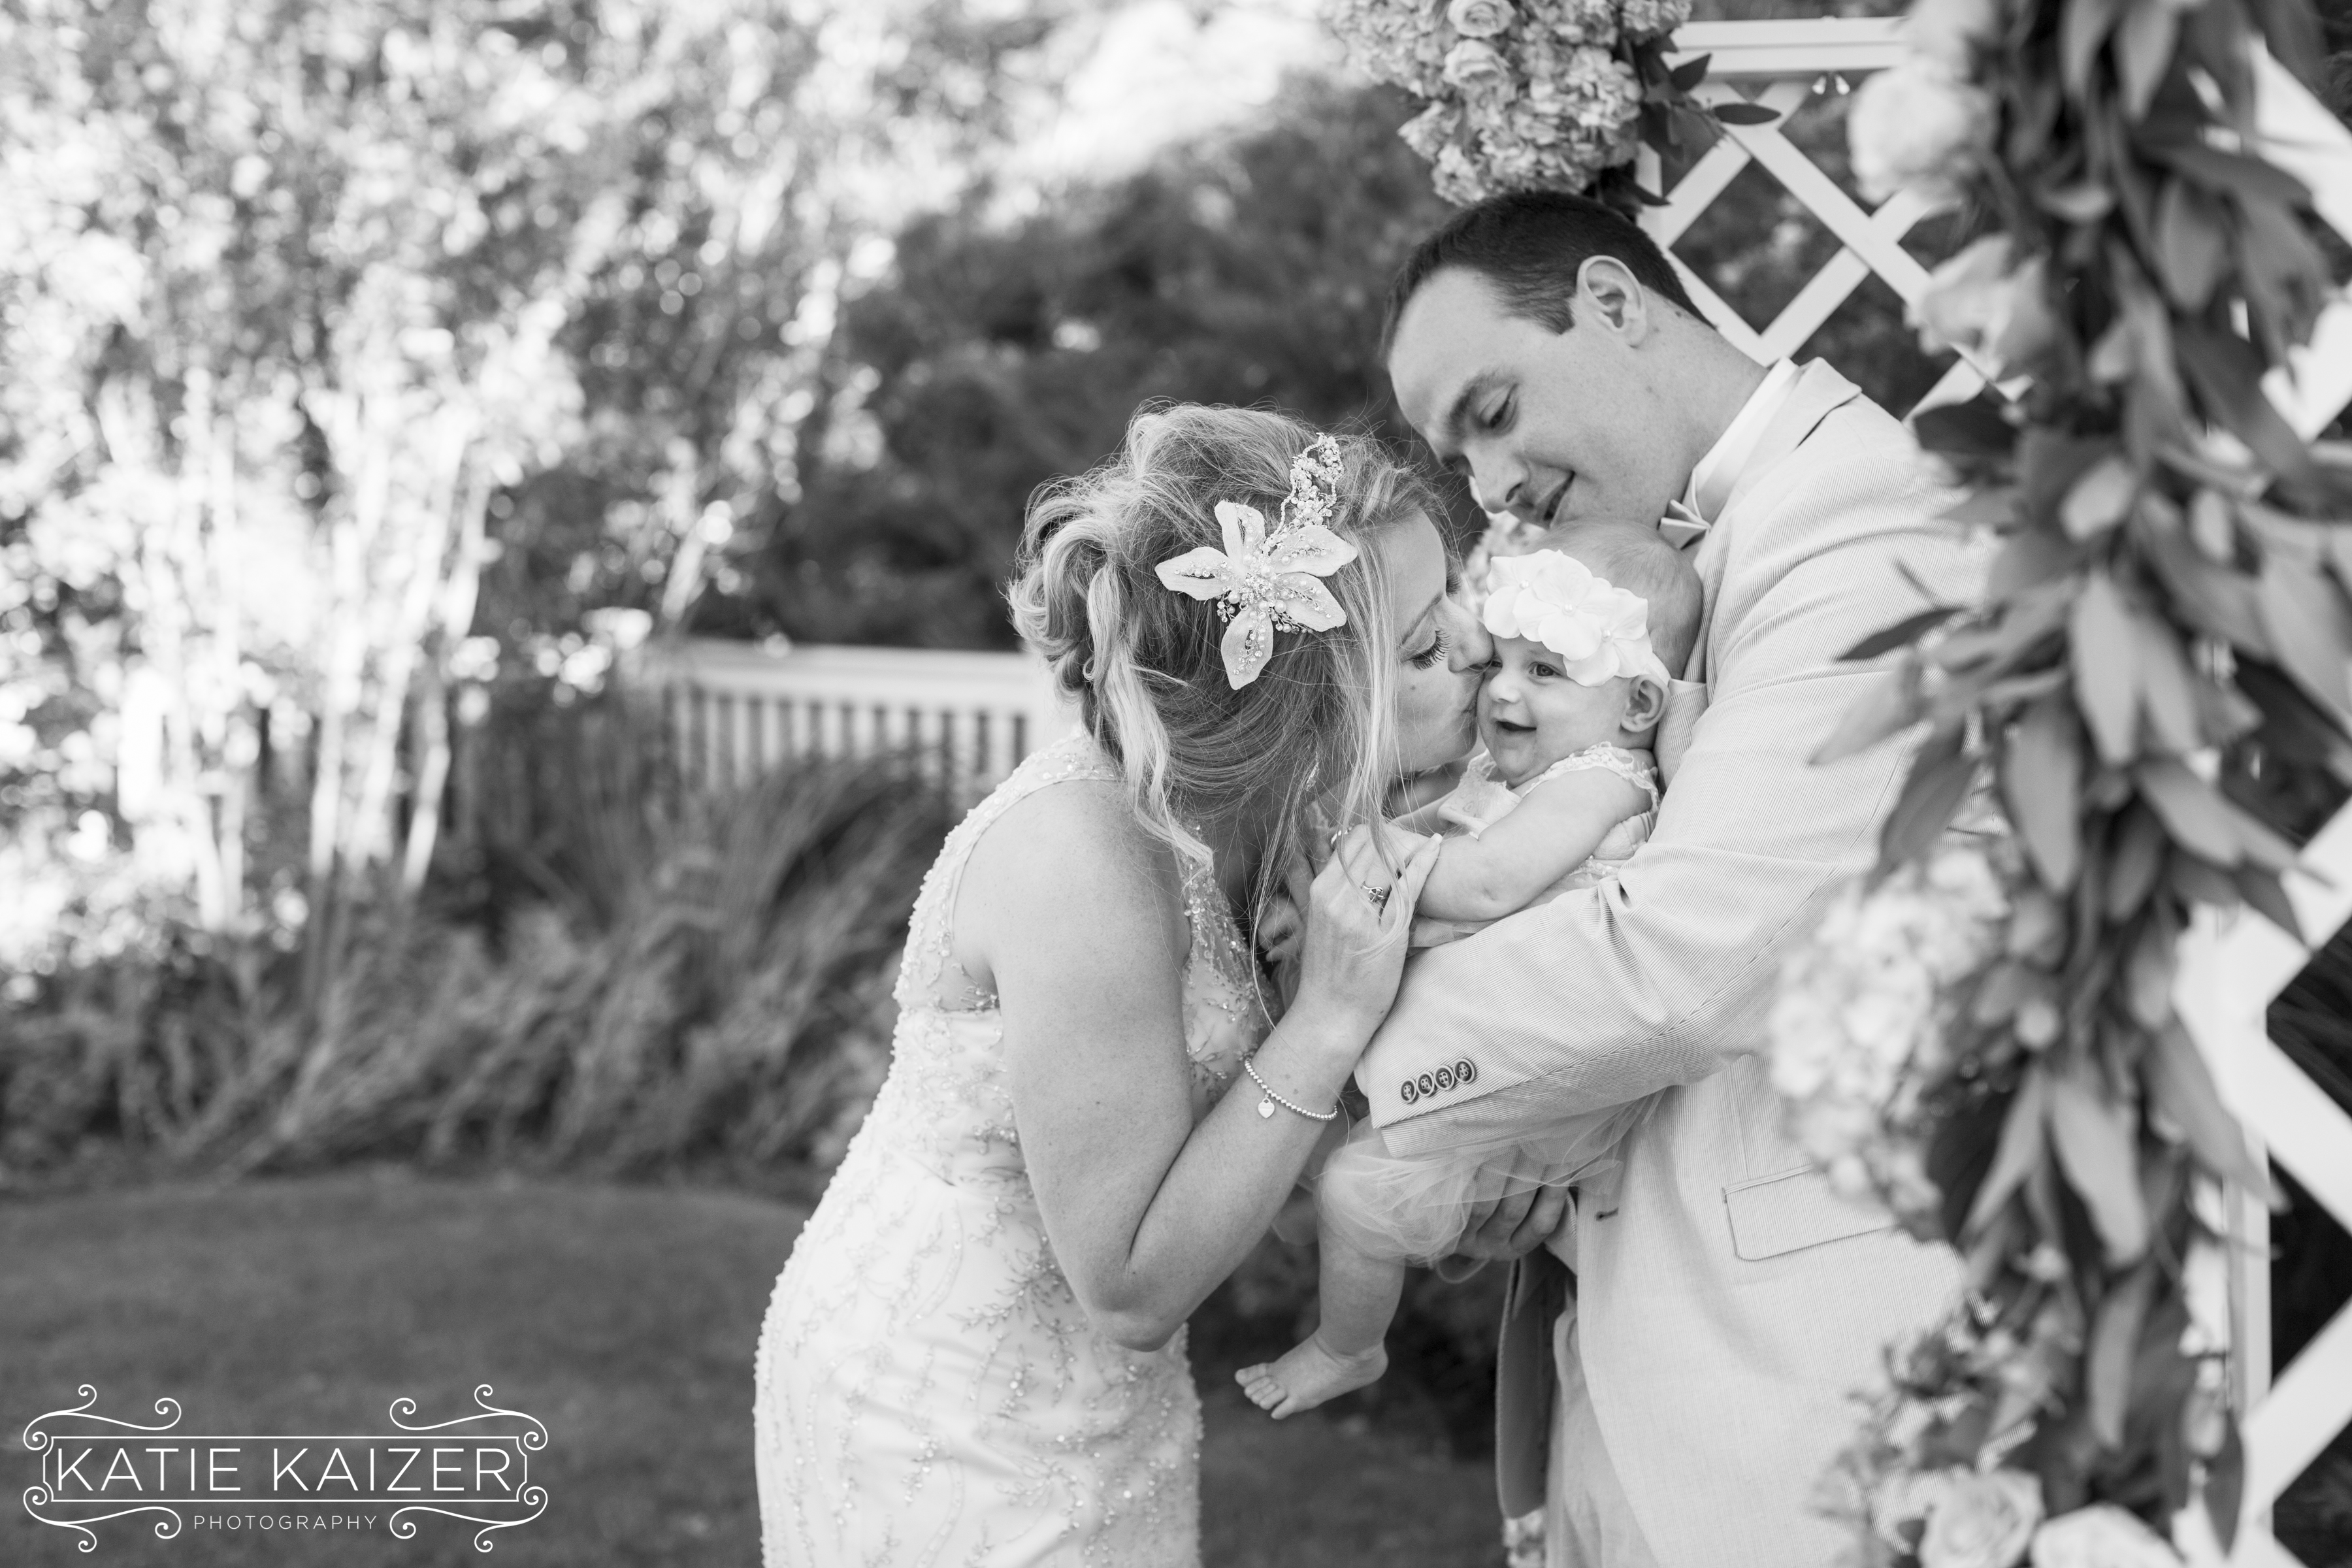 Paige&Tyler_007_KatieKaizerPhotography